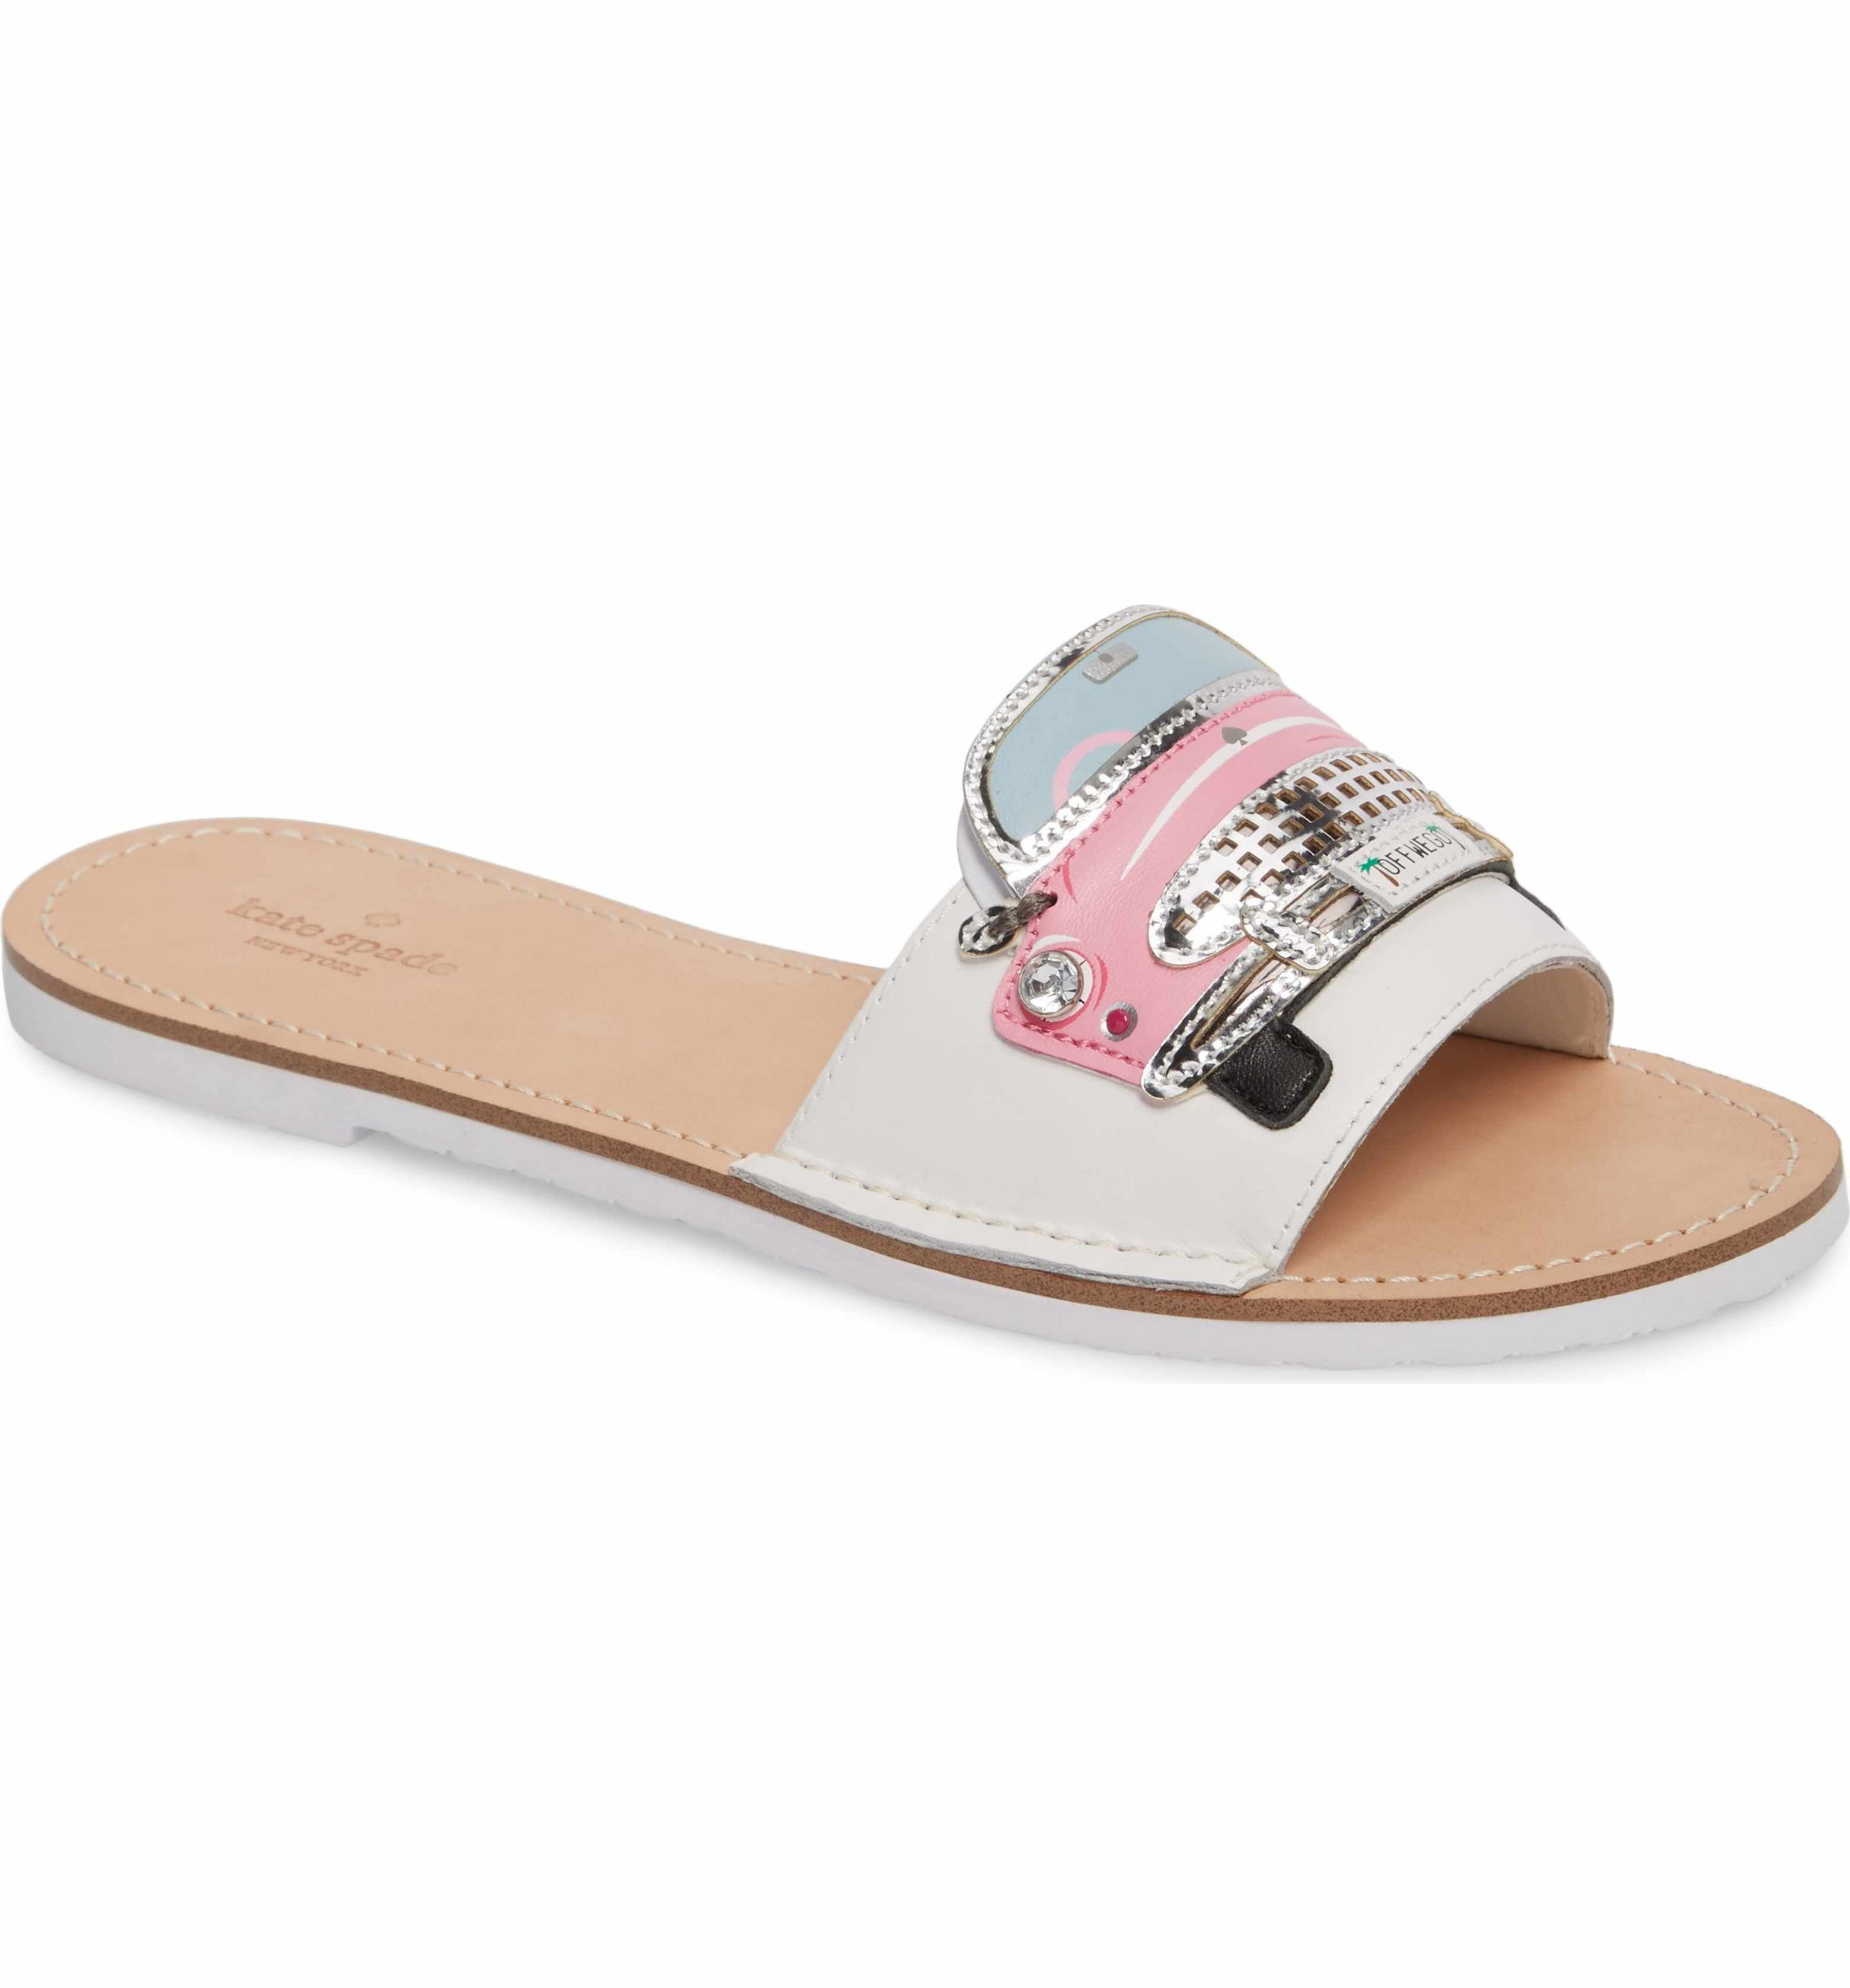 97e18619dd6d Main Image - kate spade new york isla vintage car sandal (Women ...